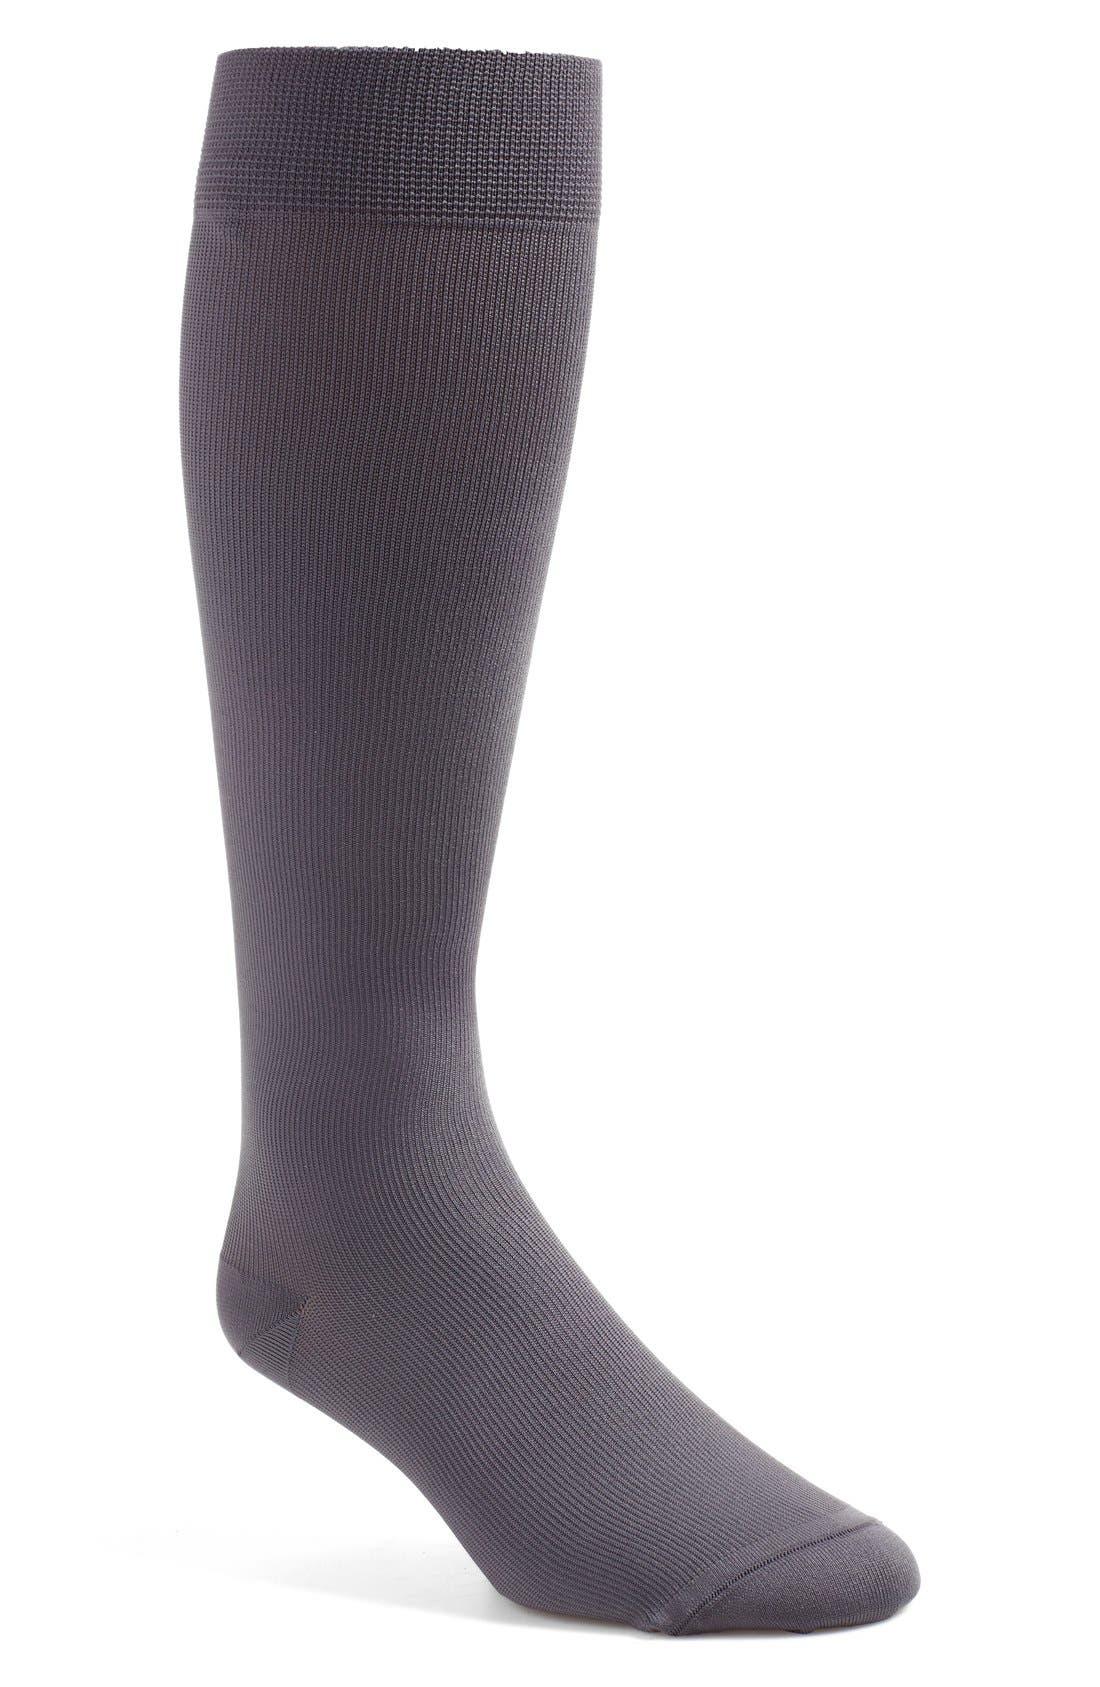 'Keynote' OvertheCalf Socks,                         Main,                         color, Grey